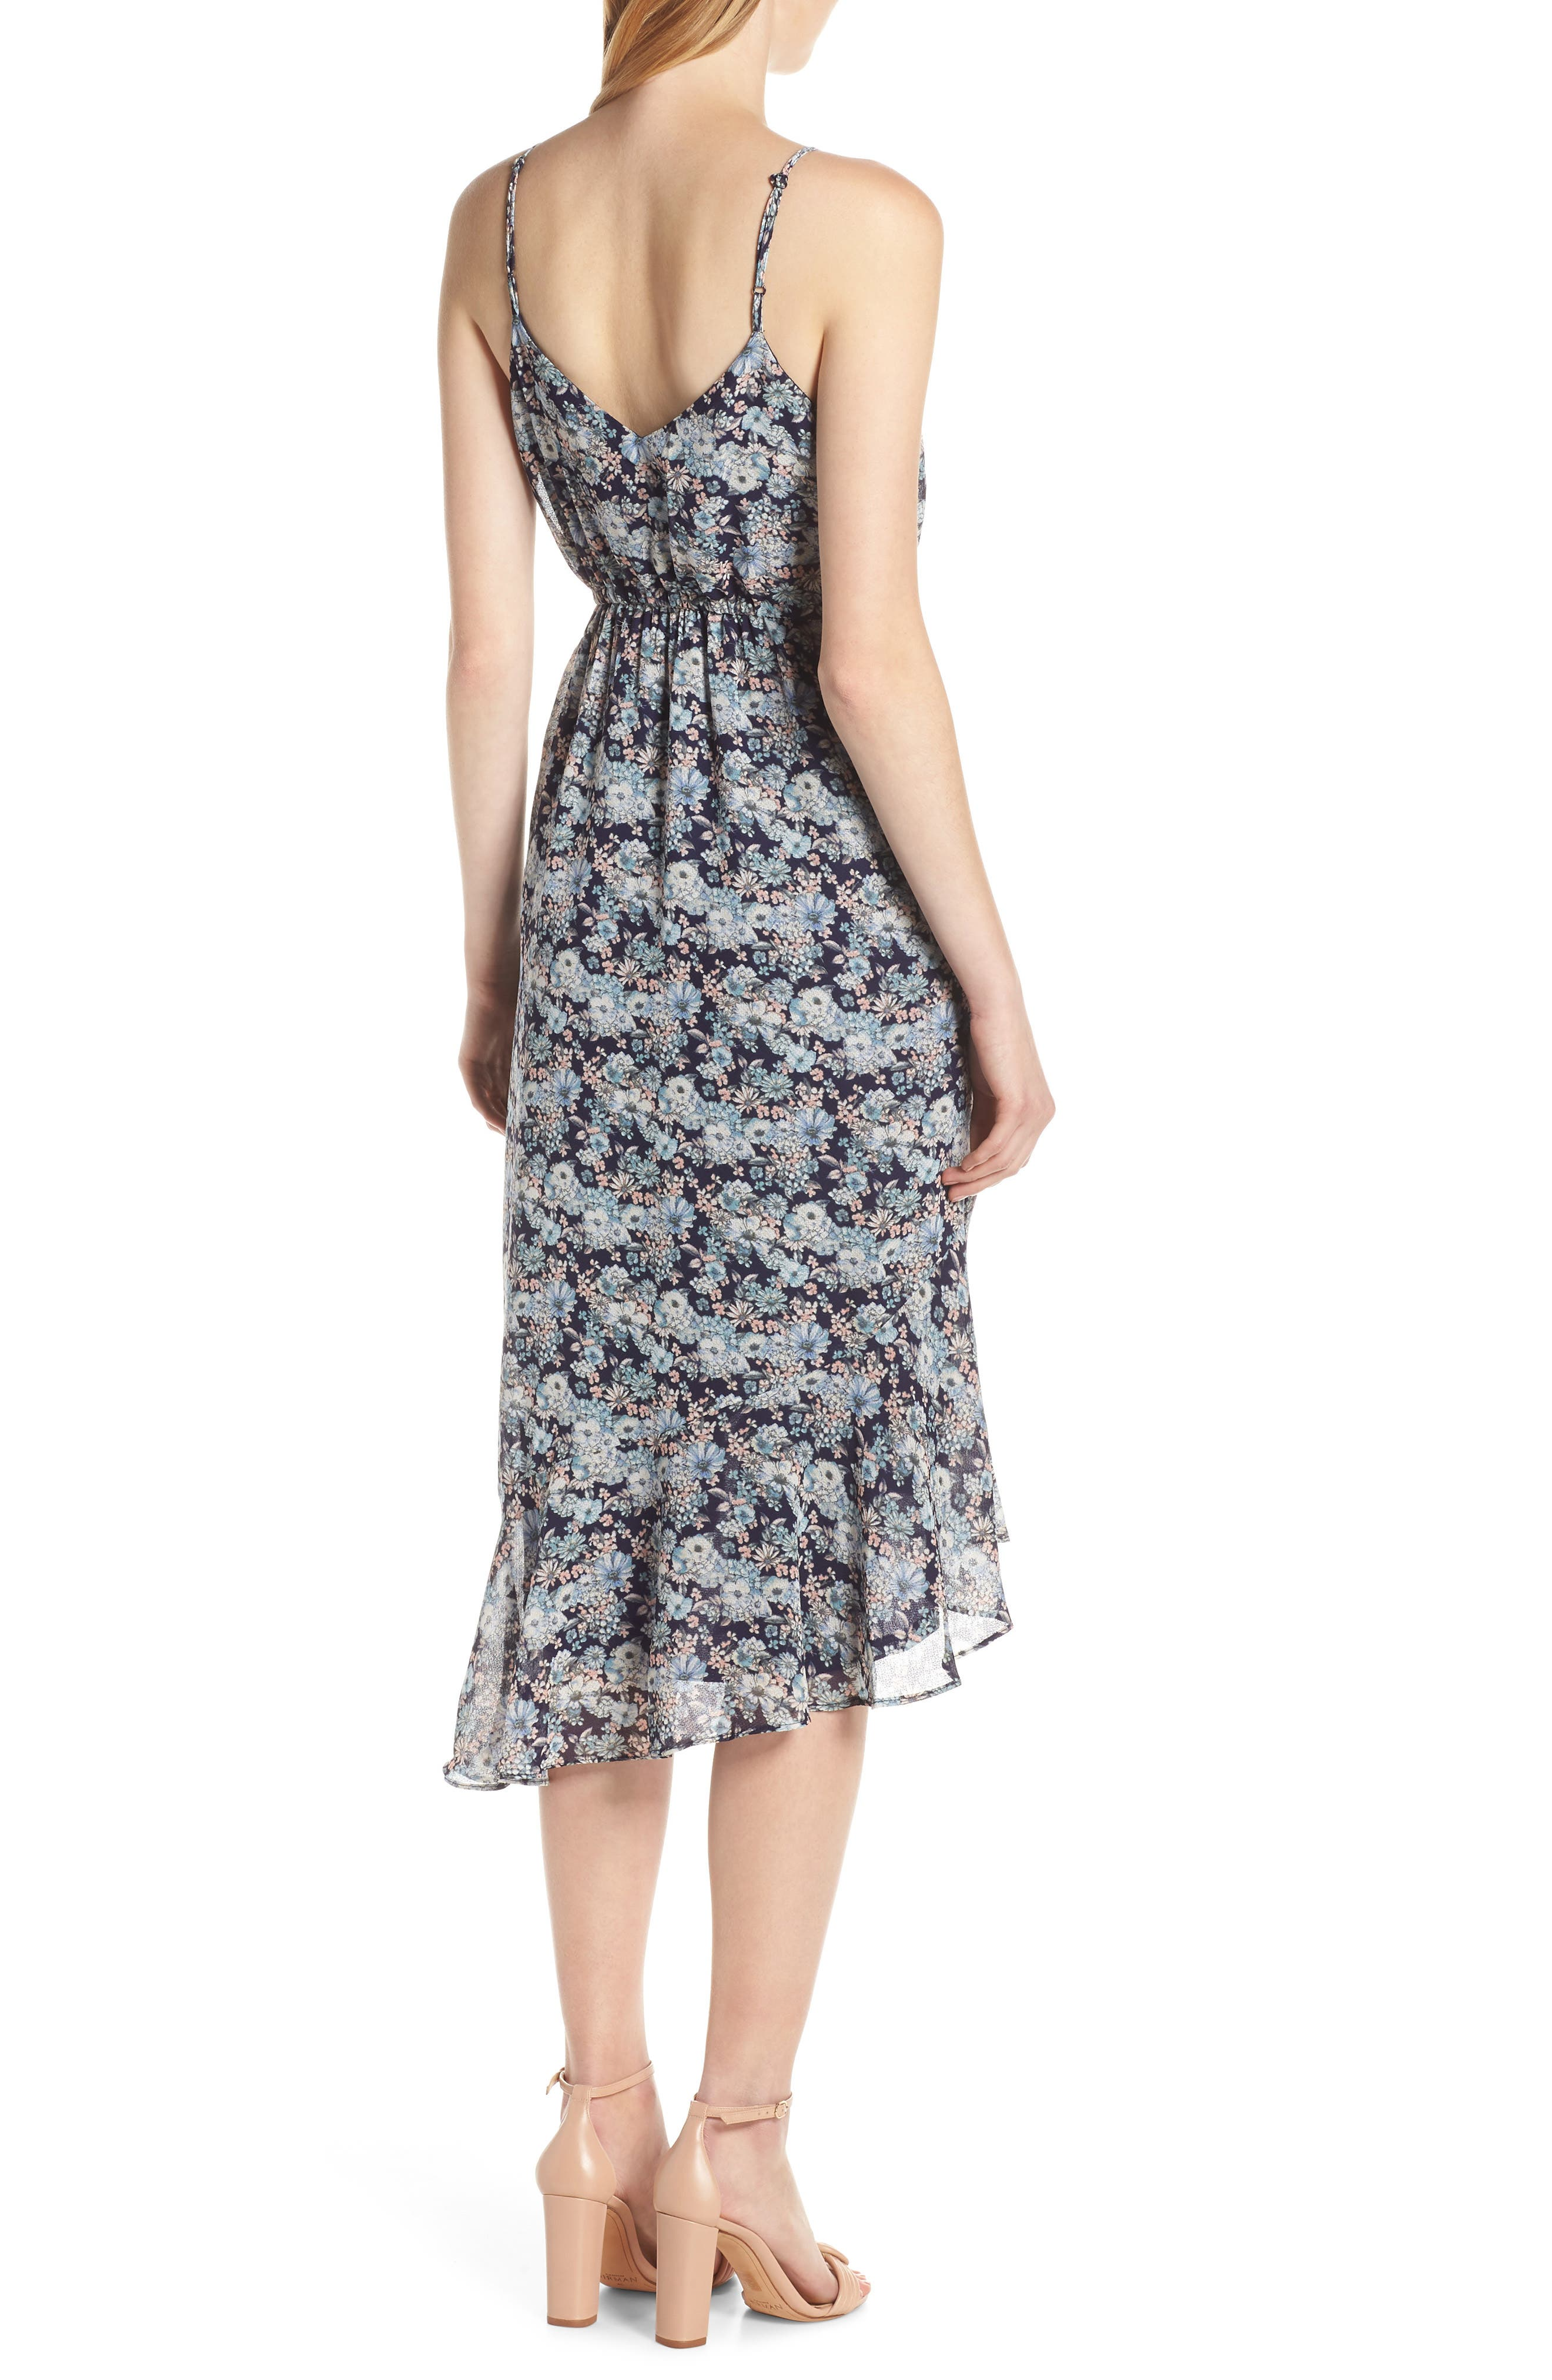 19 COOPER, Asymmetrical Ruffle Hem Dress, Alternate thumbnail 2, color, 410